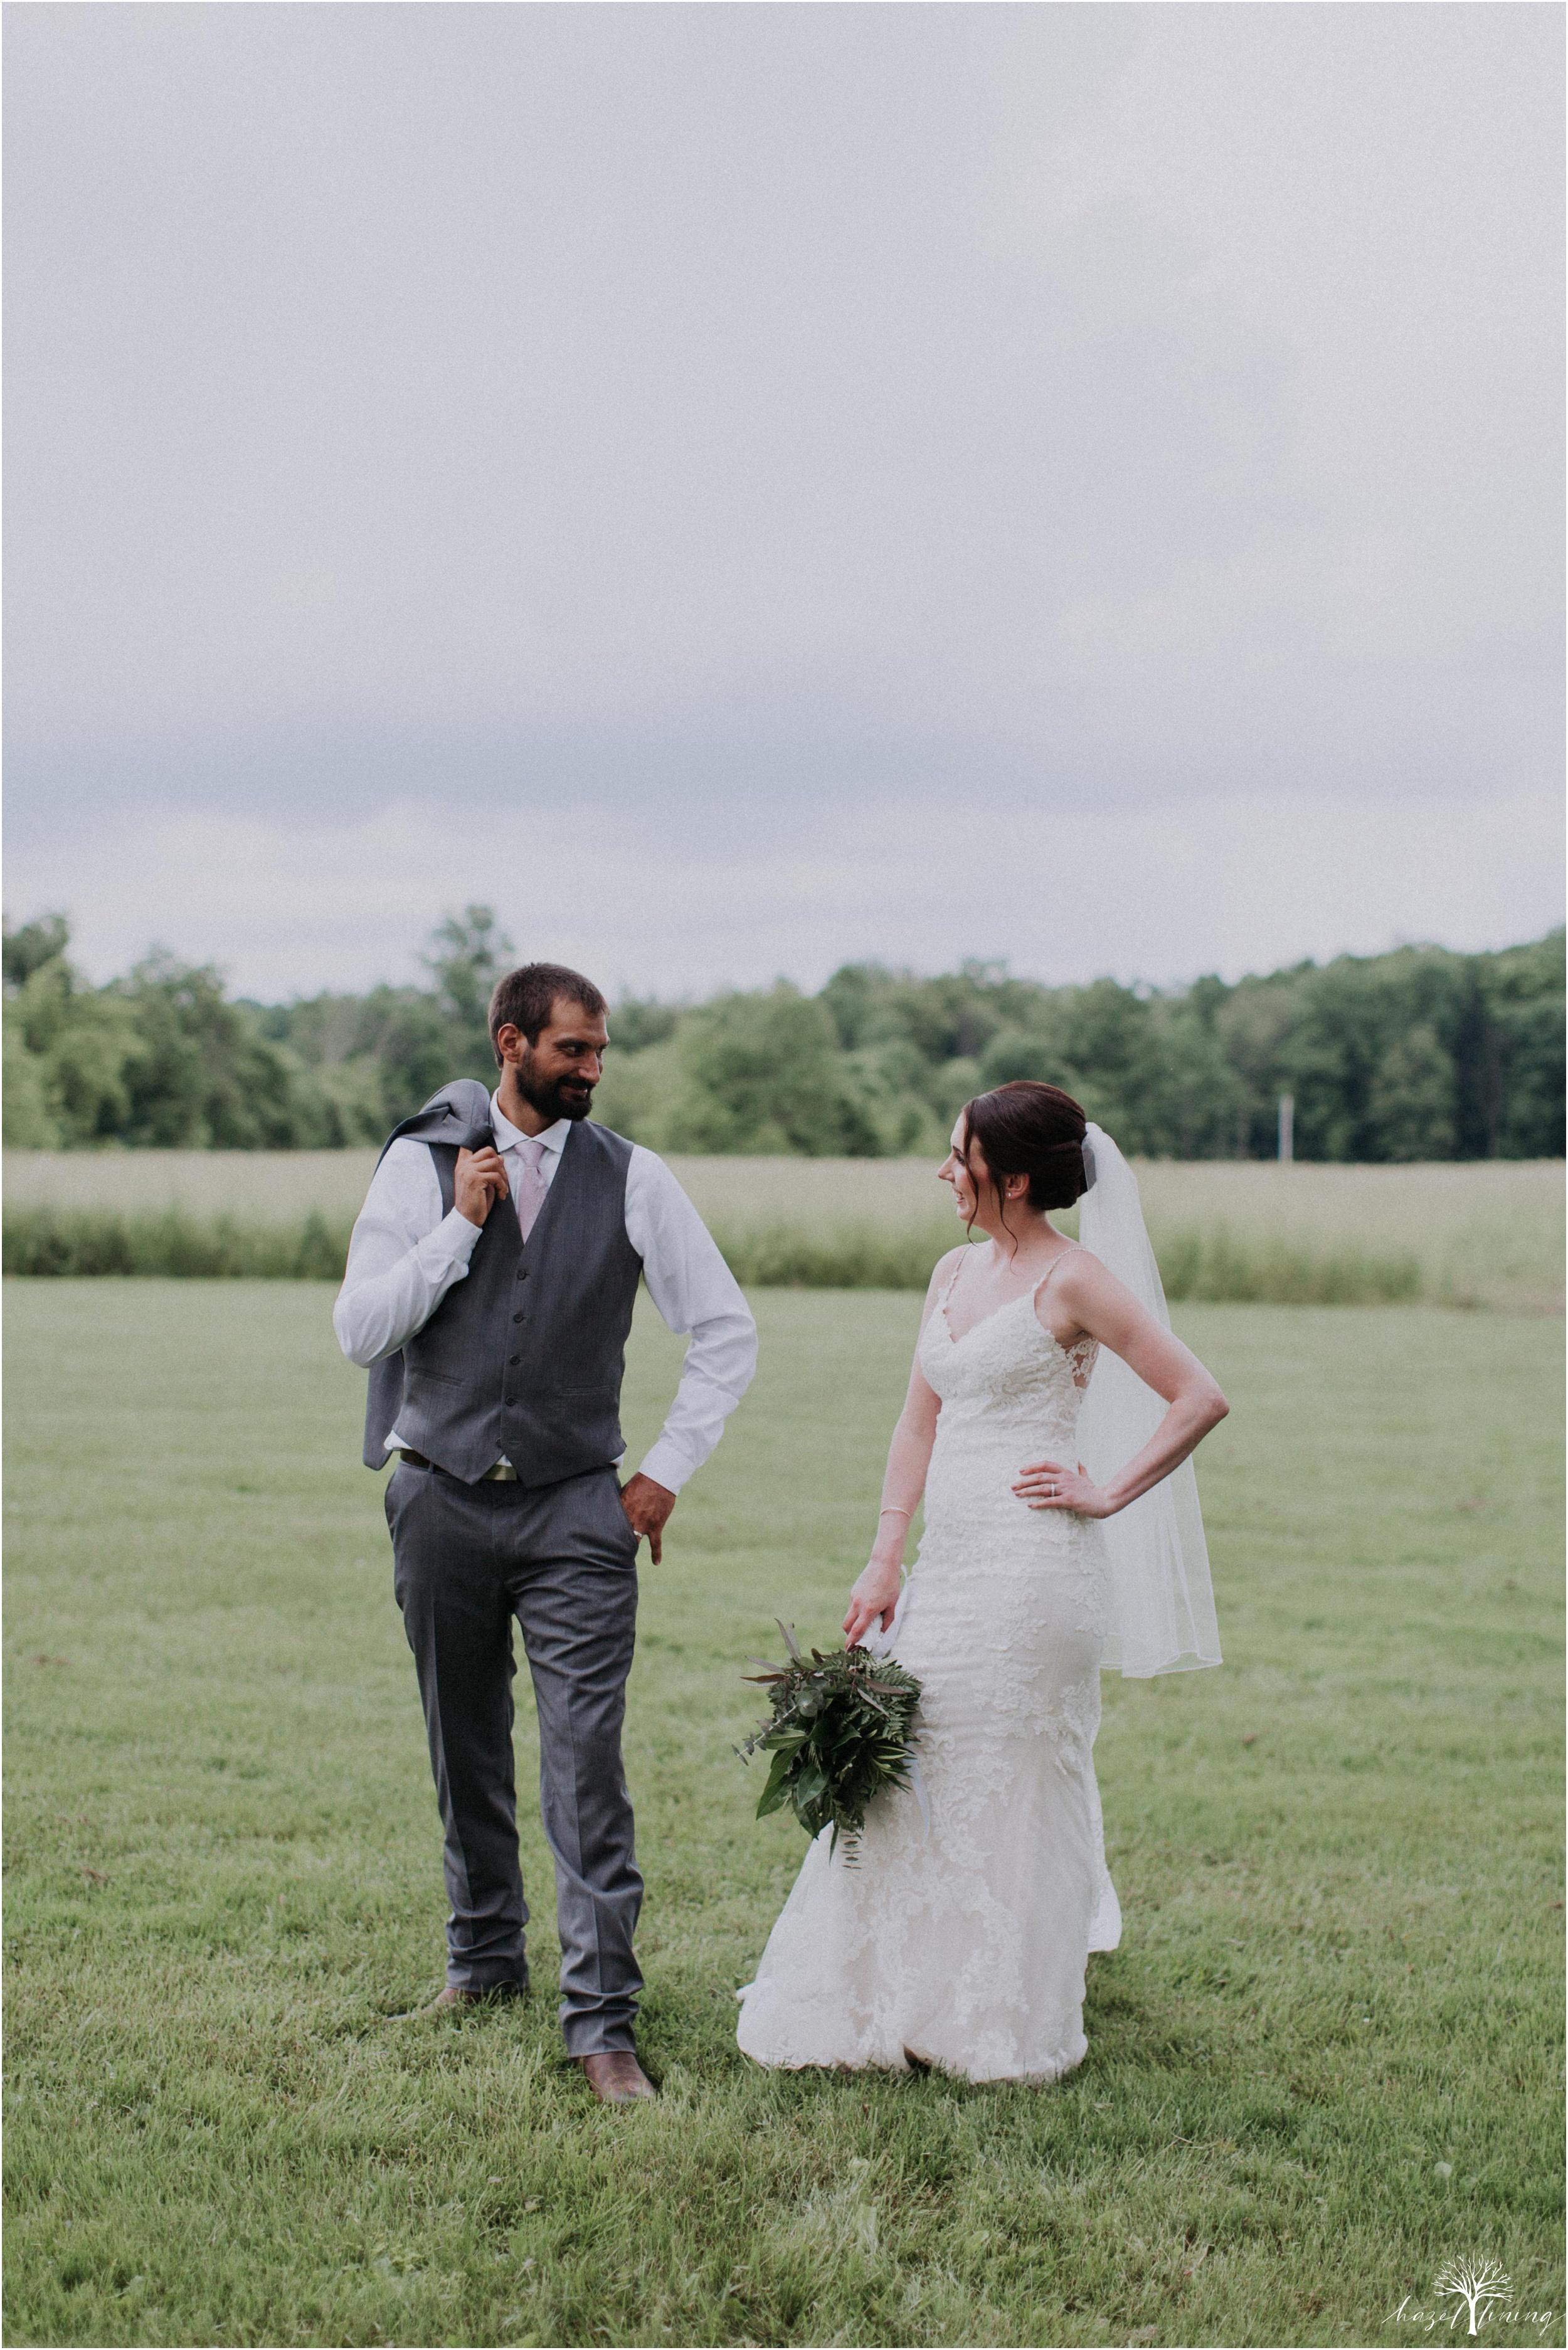 hazel-lining-travel-wedding-elopement-photography-lisa-landon-shoemaker-the-farm-bakery-and-events-bucks-county-quakertown-pennsylvania-summer-country-outdoor-farm-wedding_0097.jpg